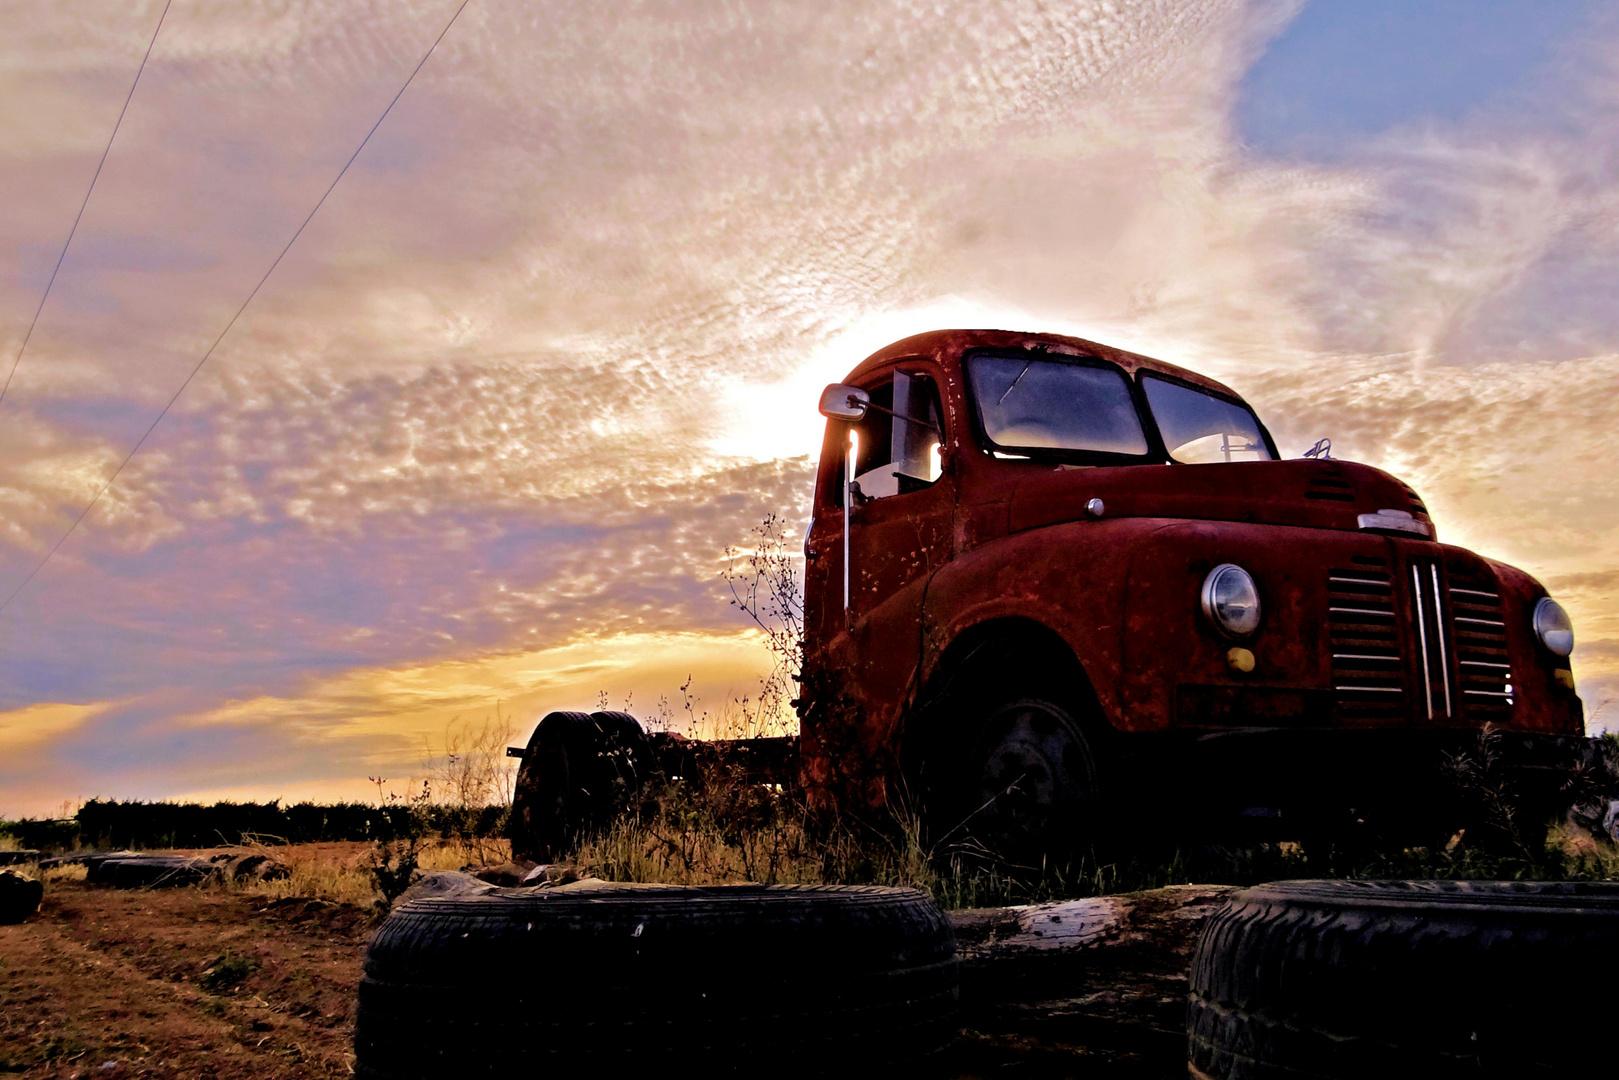 Nostalgic Truck